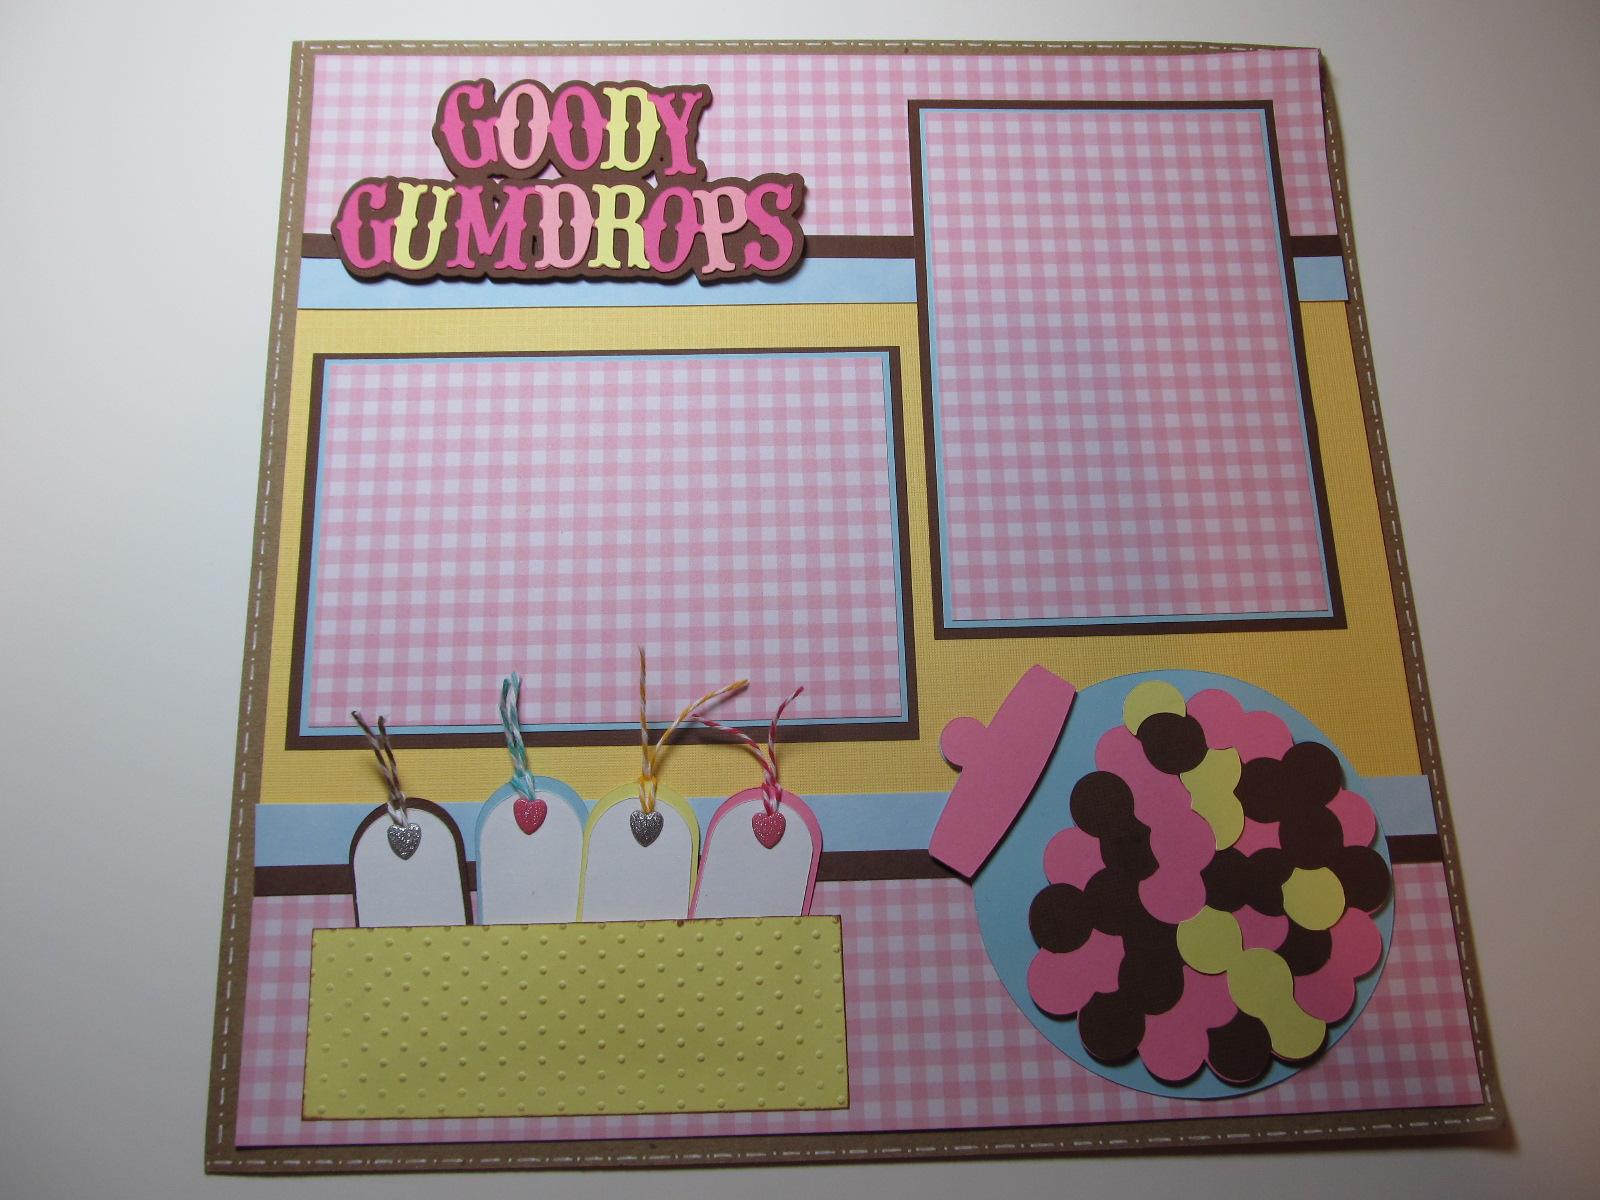 Creative Cricut Designs & More....: Goody Gumdrops Scrapbook Layout